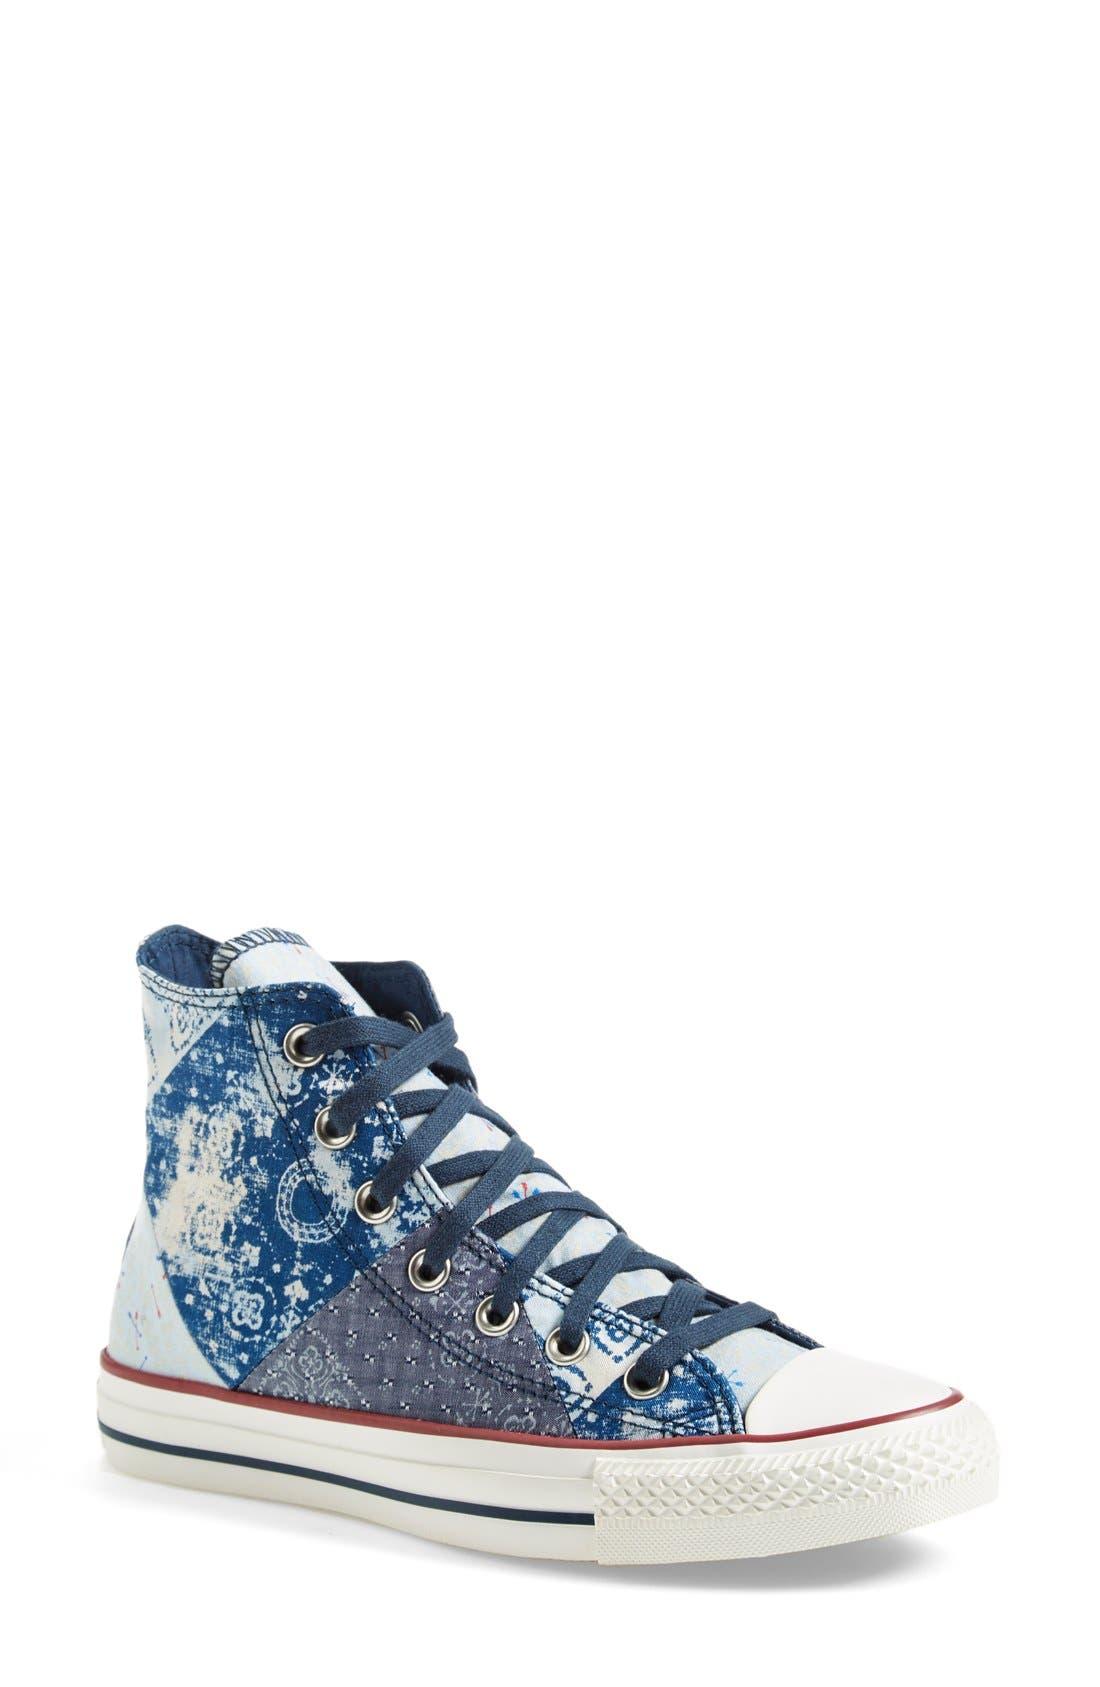 Main Image - Converse Chuck Taylor® All Star® 'Multi Bandana' High Top Sneaker (Women)